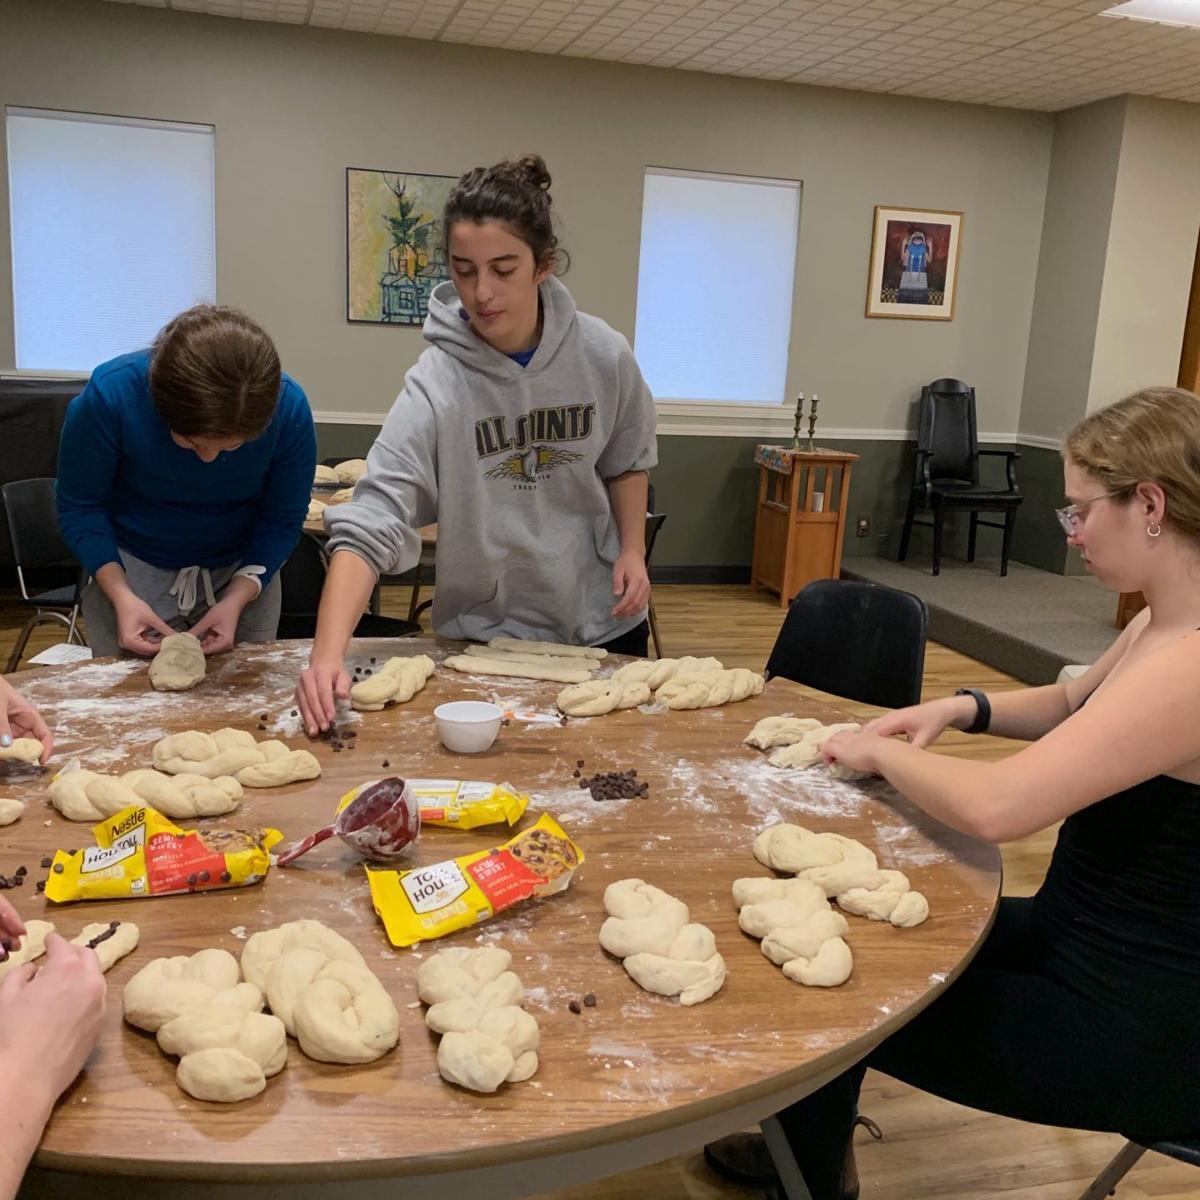 Four female K.U. students braid raw challah bread on a wooden table